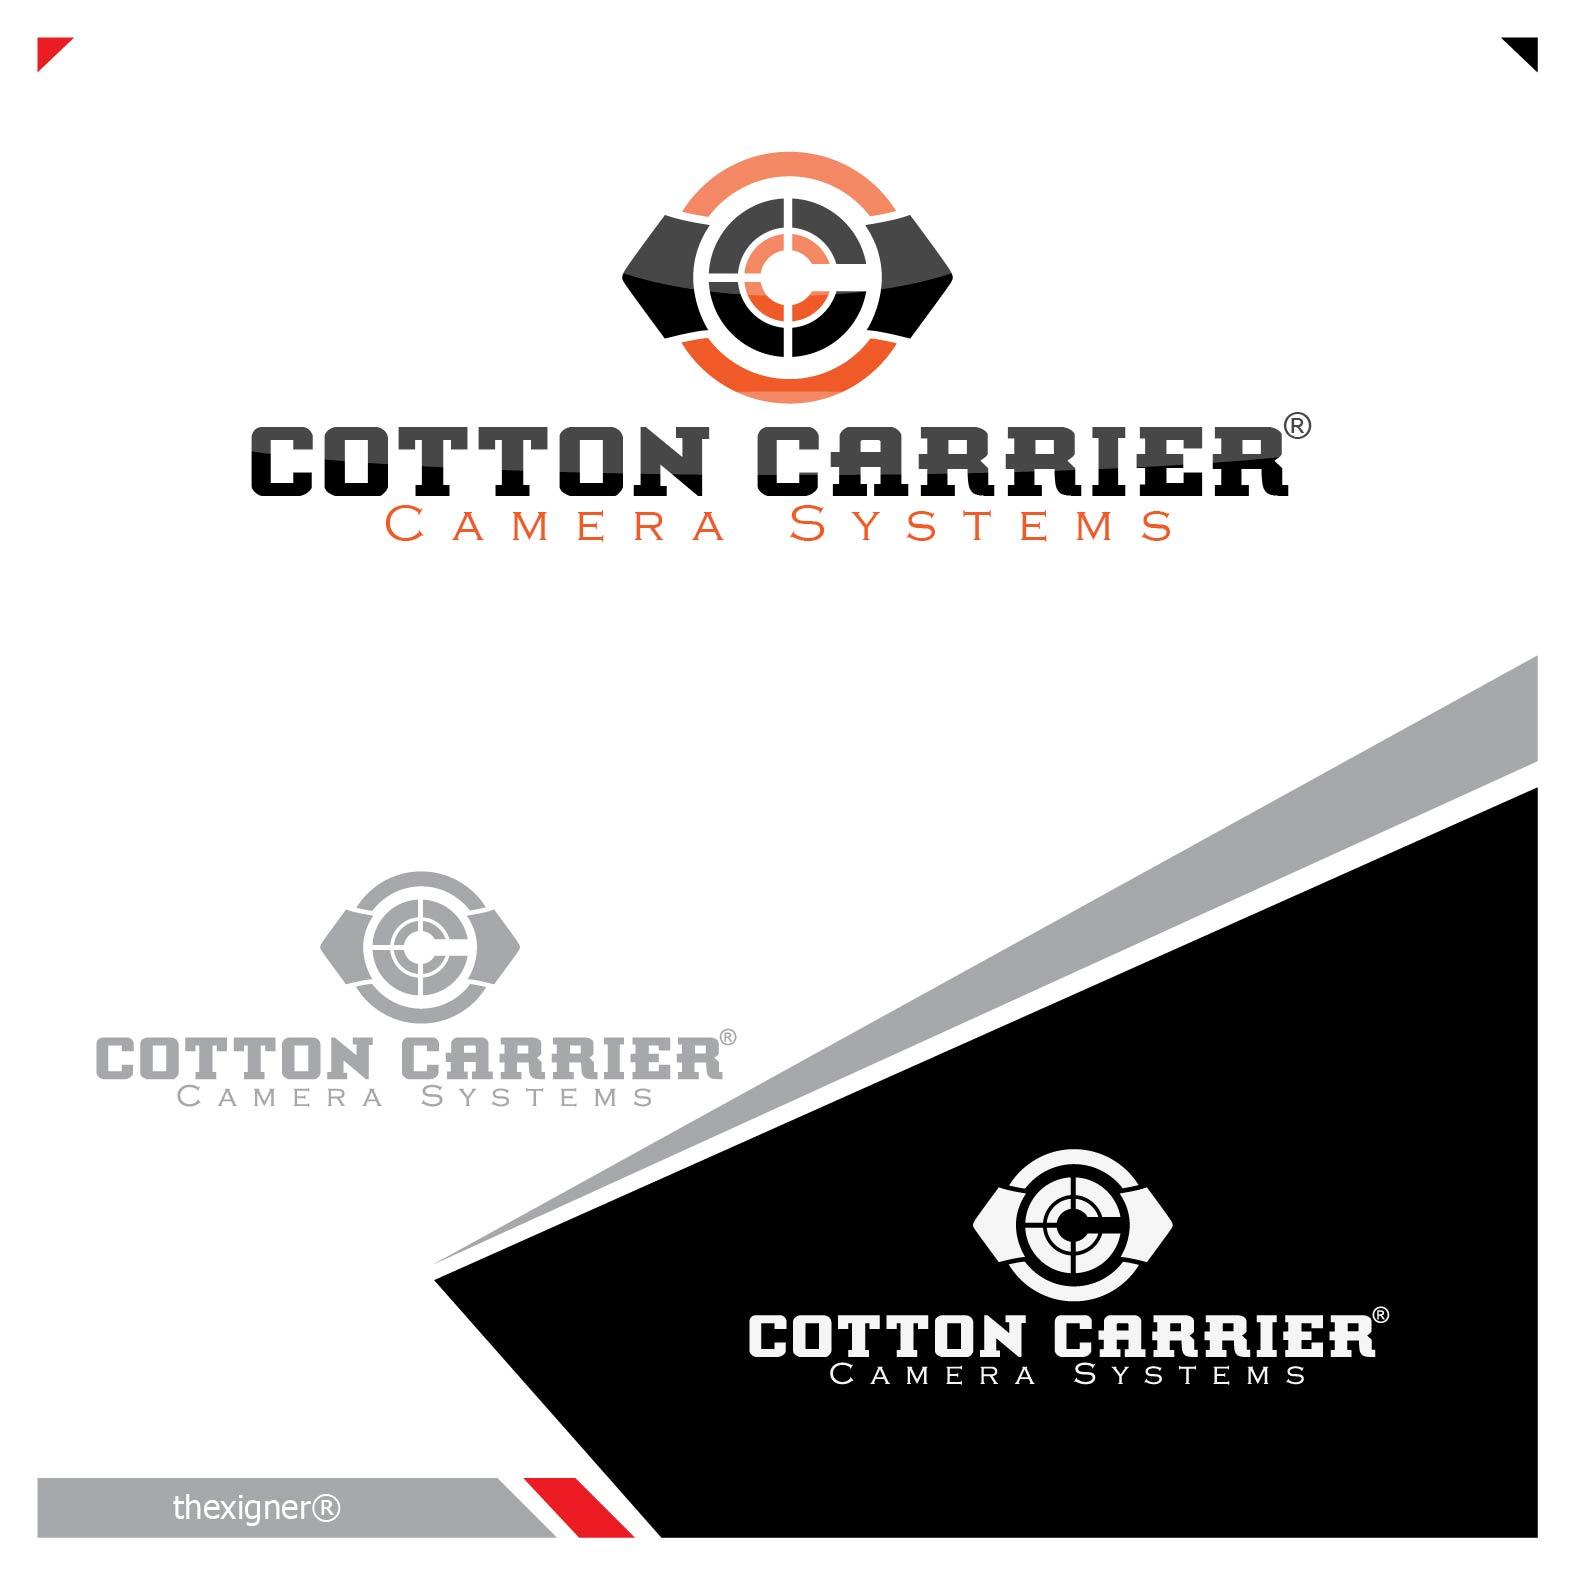 Logo Design by lagalag - Entry No. 10 in the Logo Design Contest Cotton Carrier Camera Systems Logo Design.